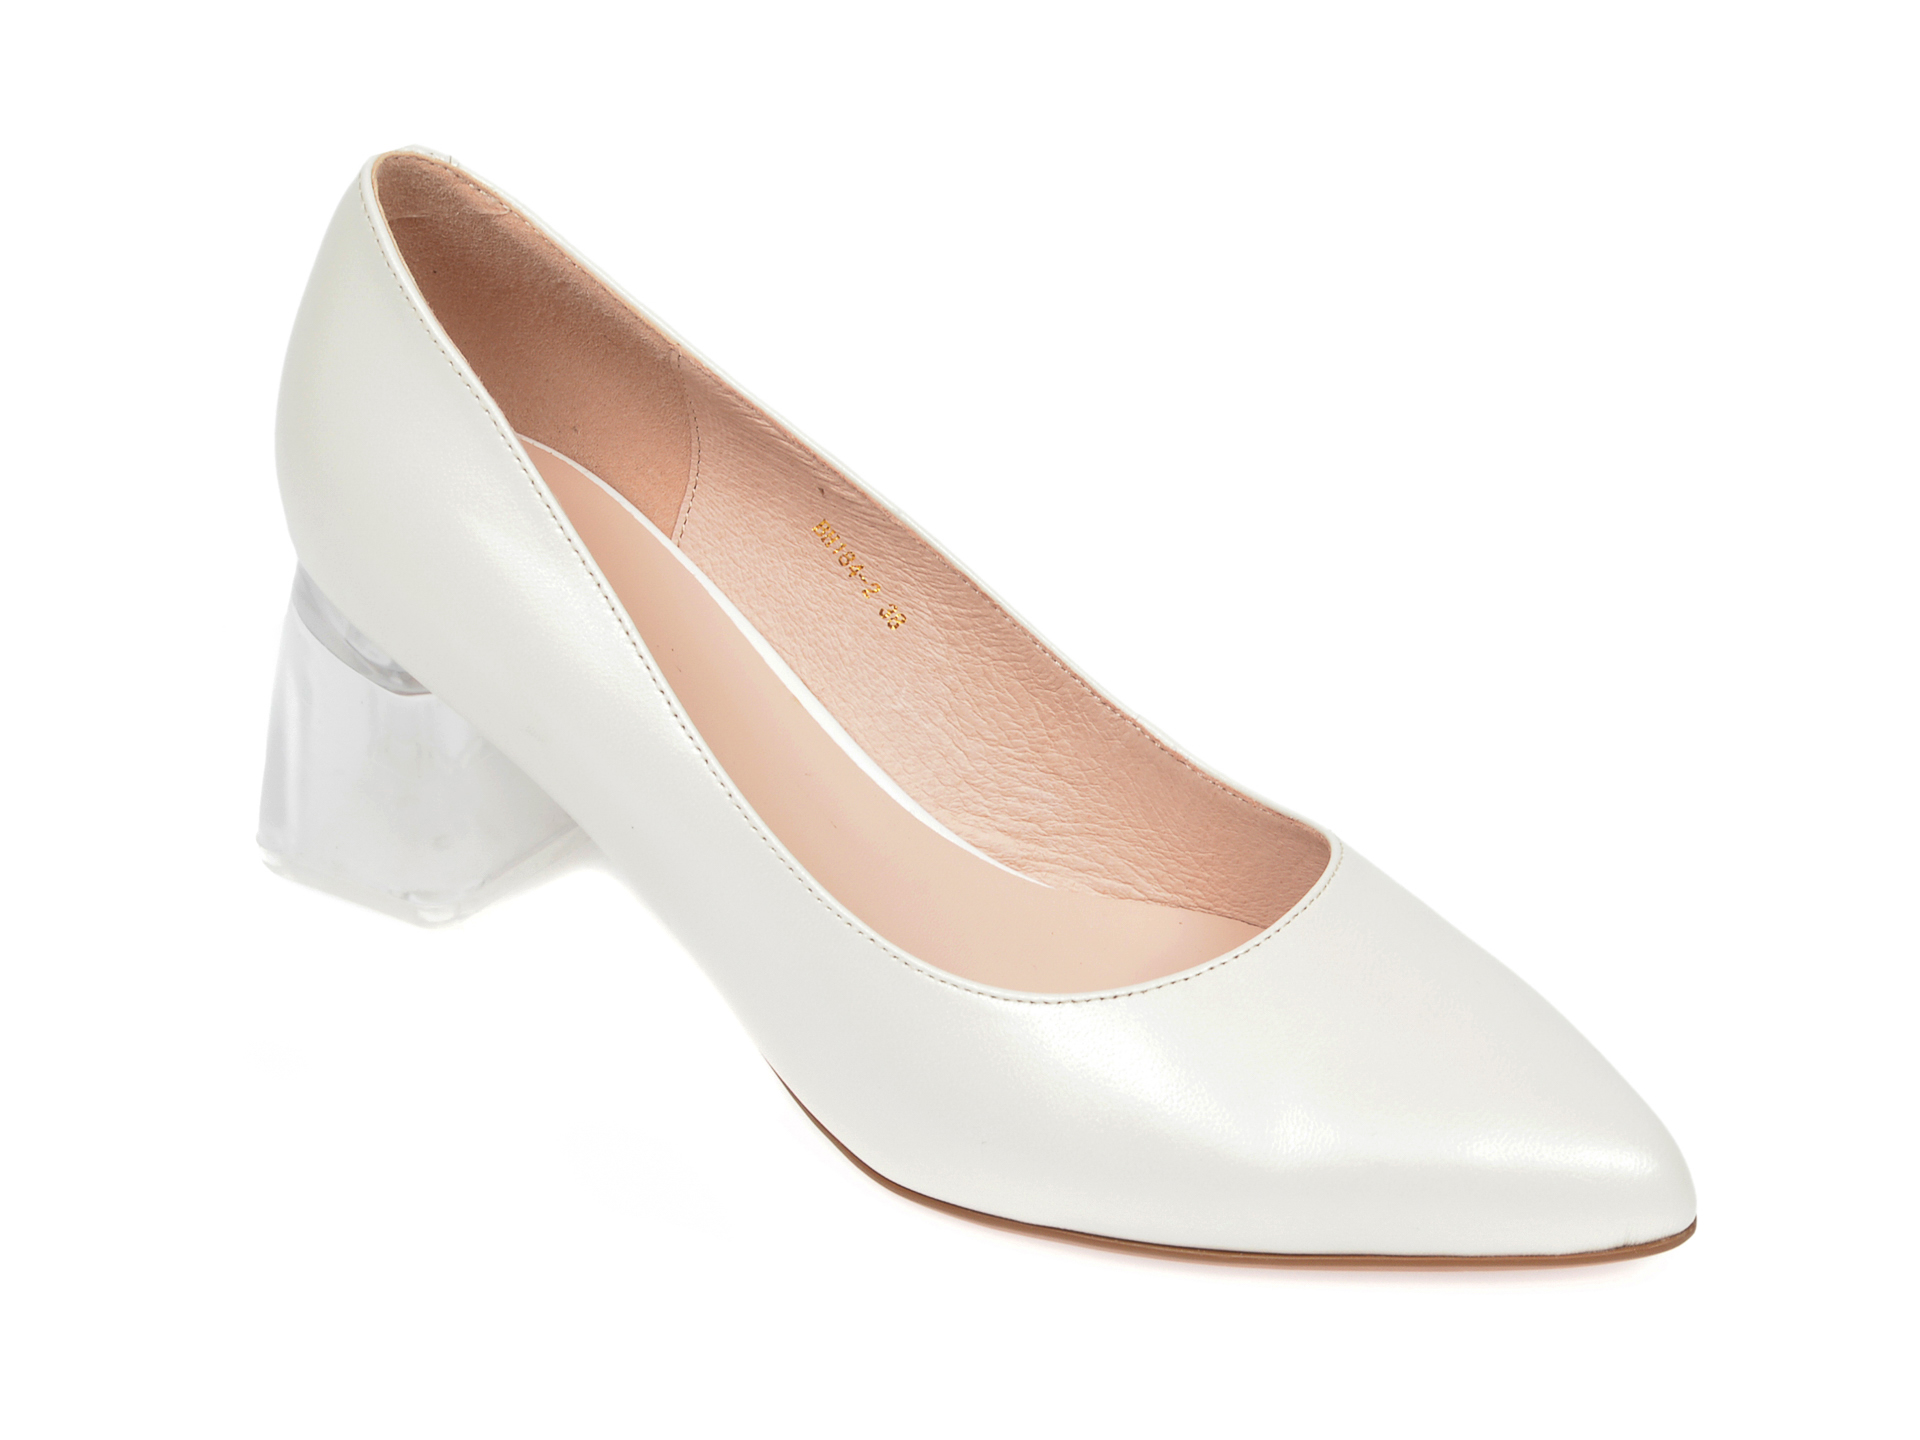 Pantofi EPICA crem, BH184, din piele naturala imagine